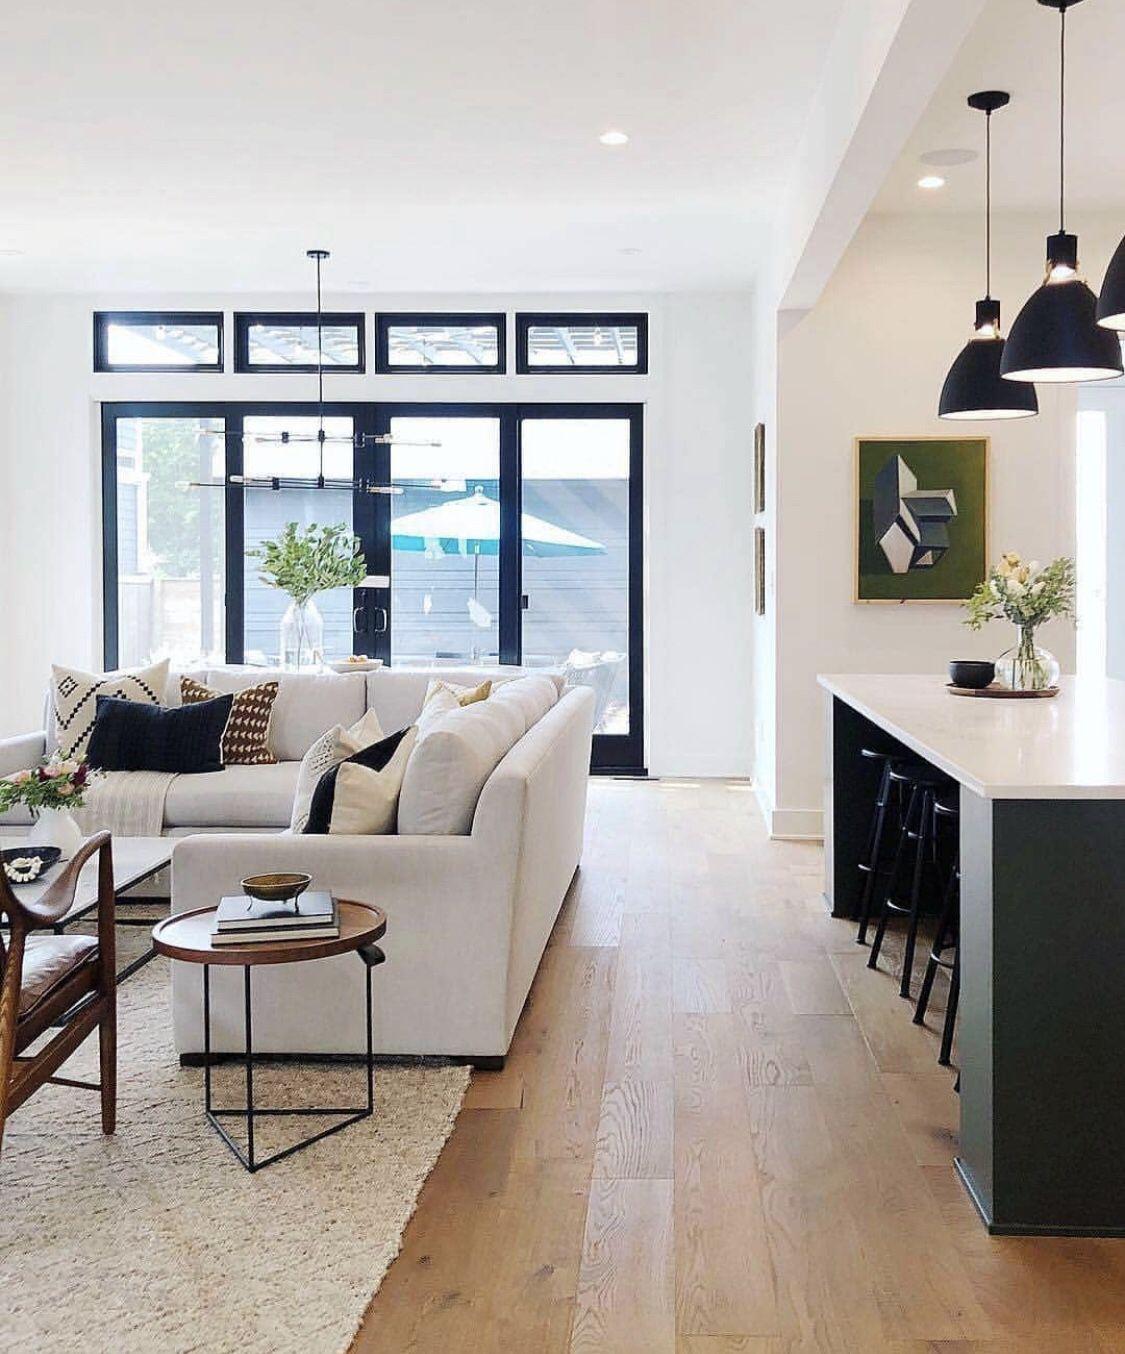 Good For Those Light Pine Floors Living Room And Kitchen Design Open Concept Living Room House Design Kitchen